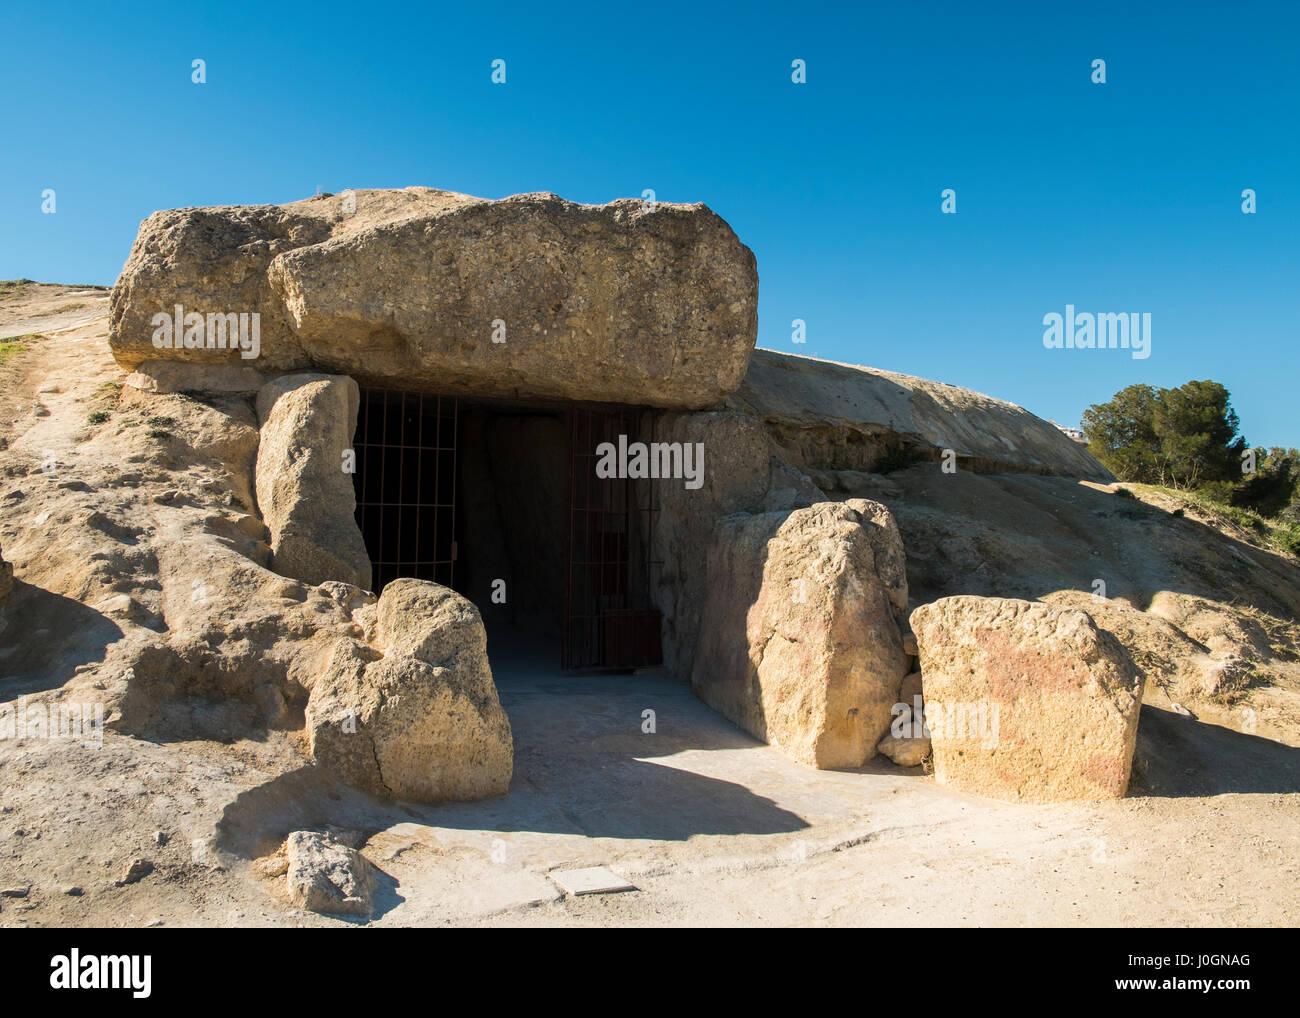 Menga Dolmen. Antequera, Málaga province, Andalusia, Spain - Stock Image